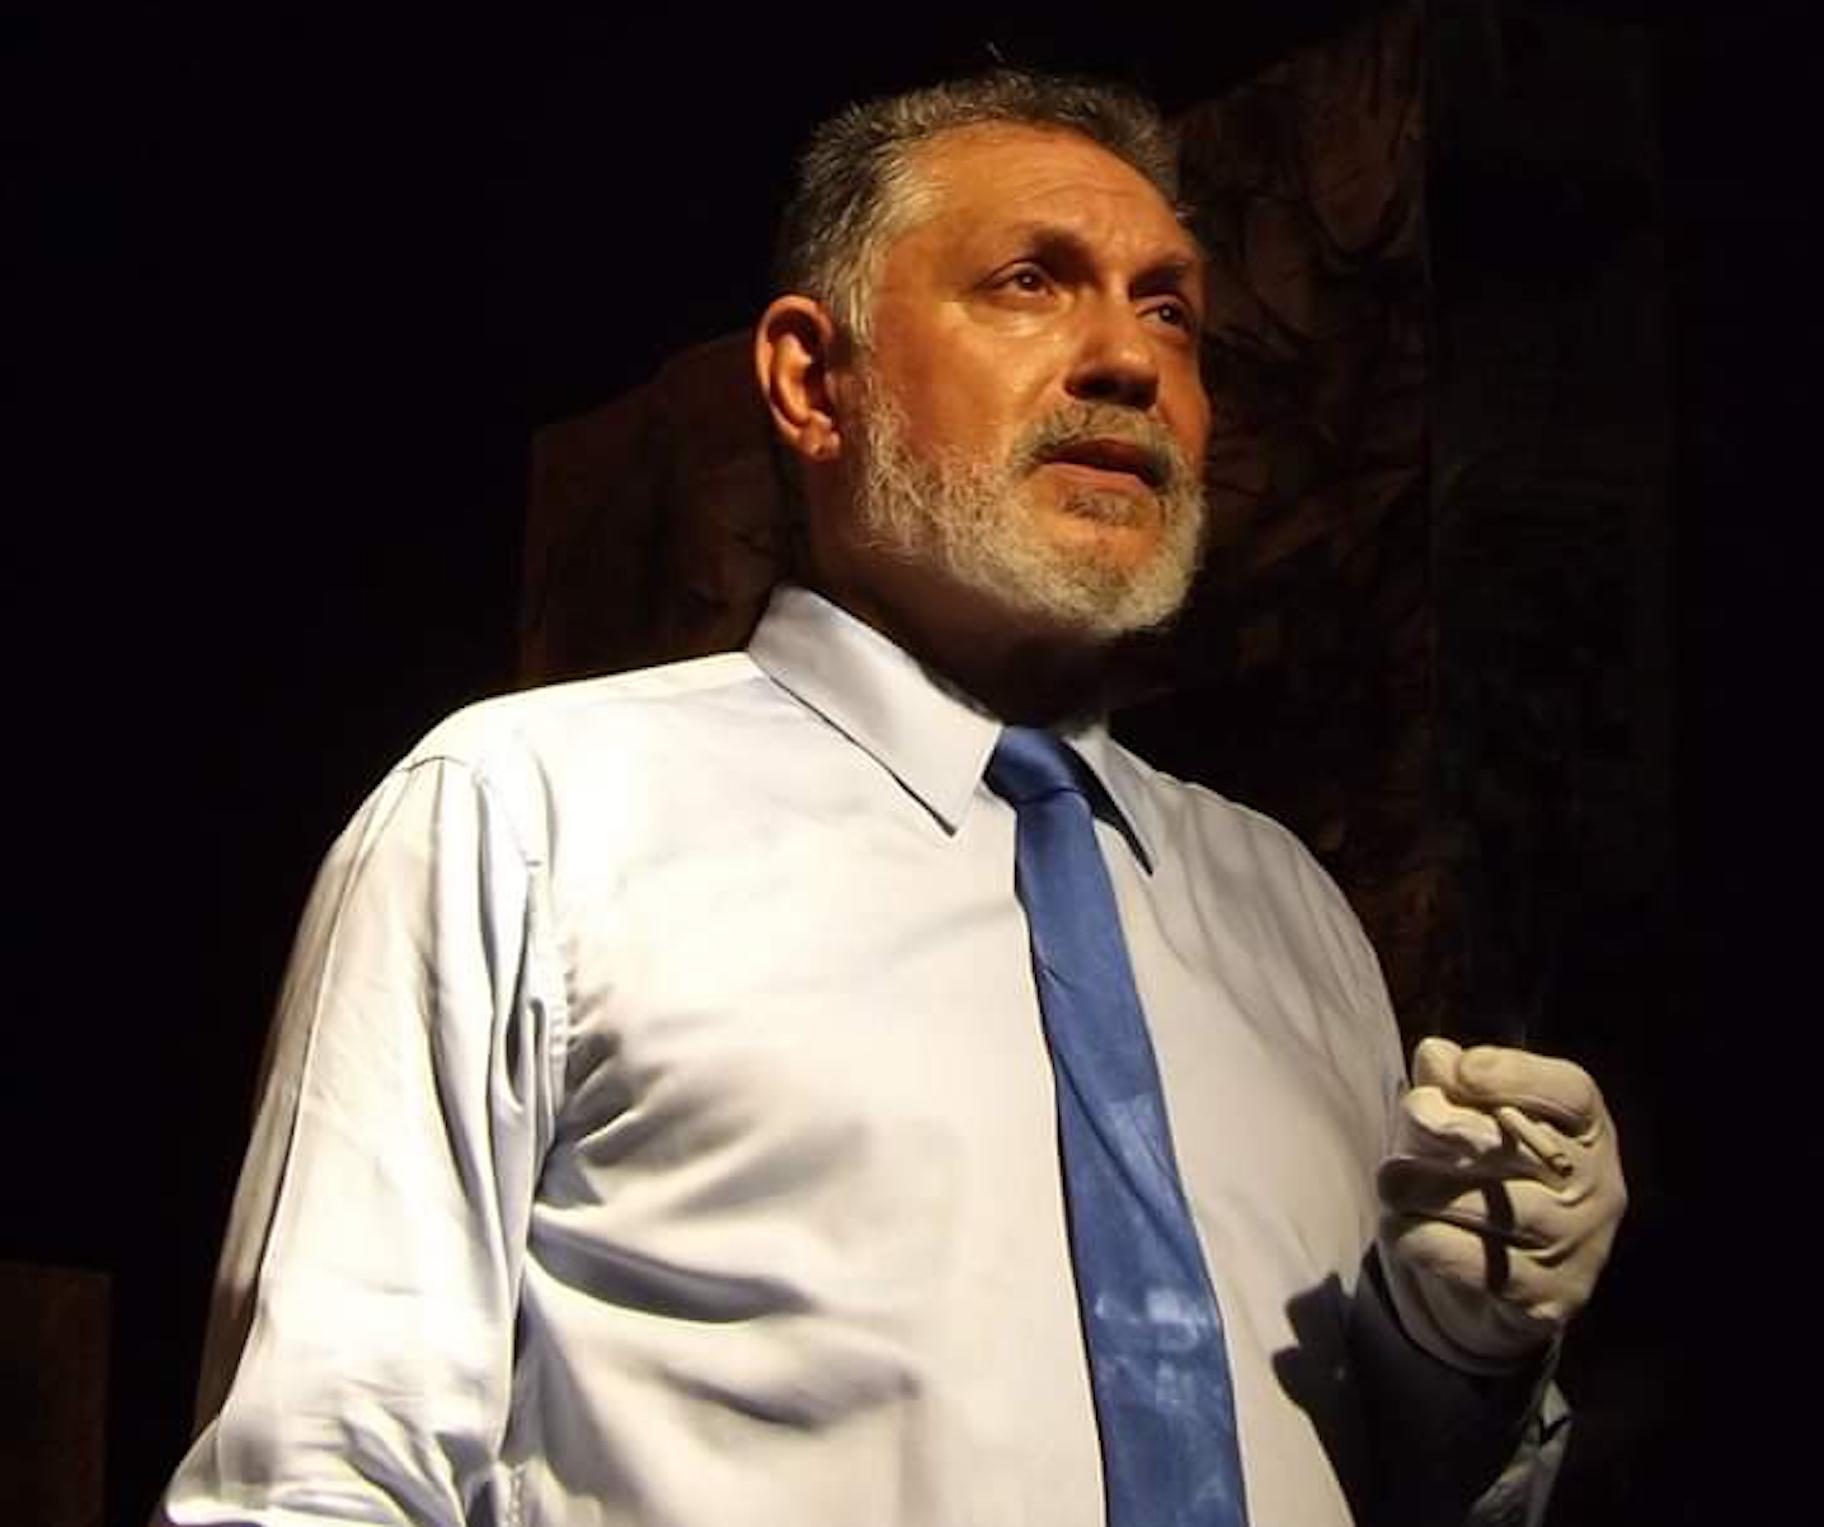 Jose Dominguez Bueno